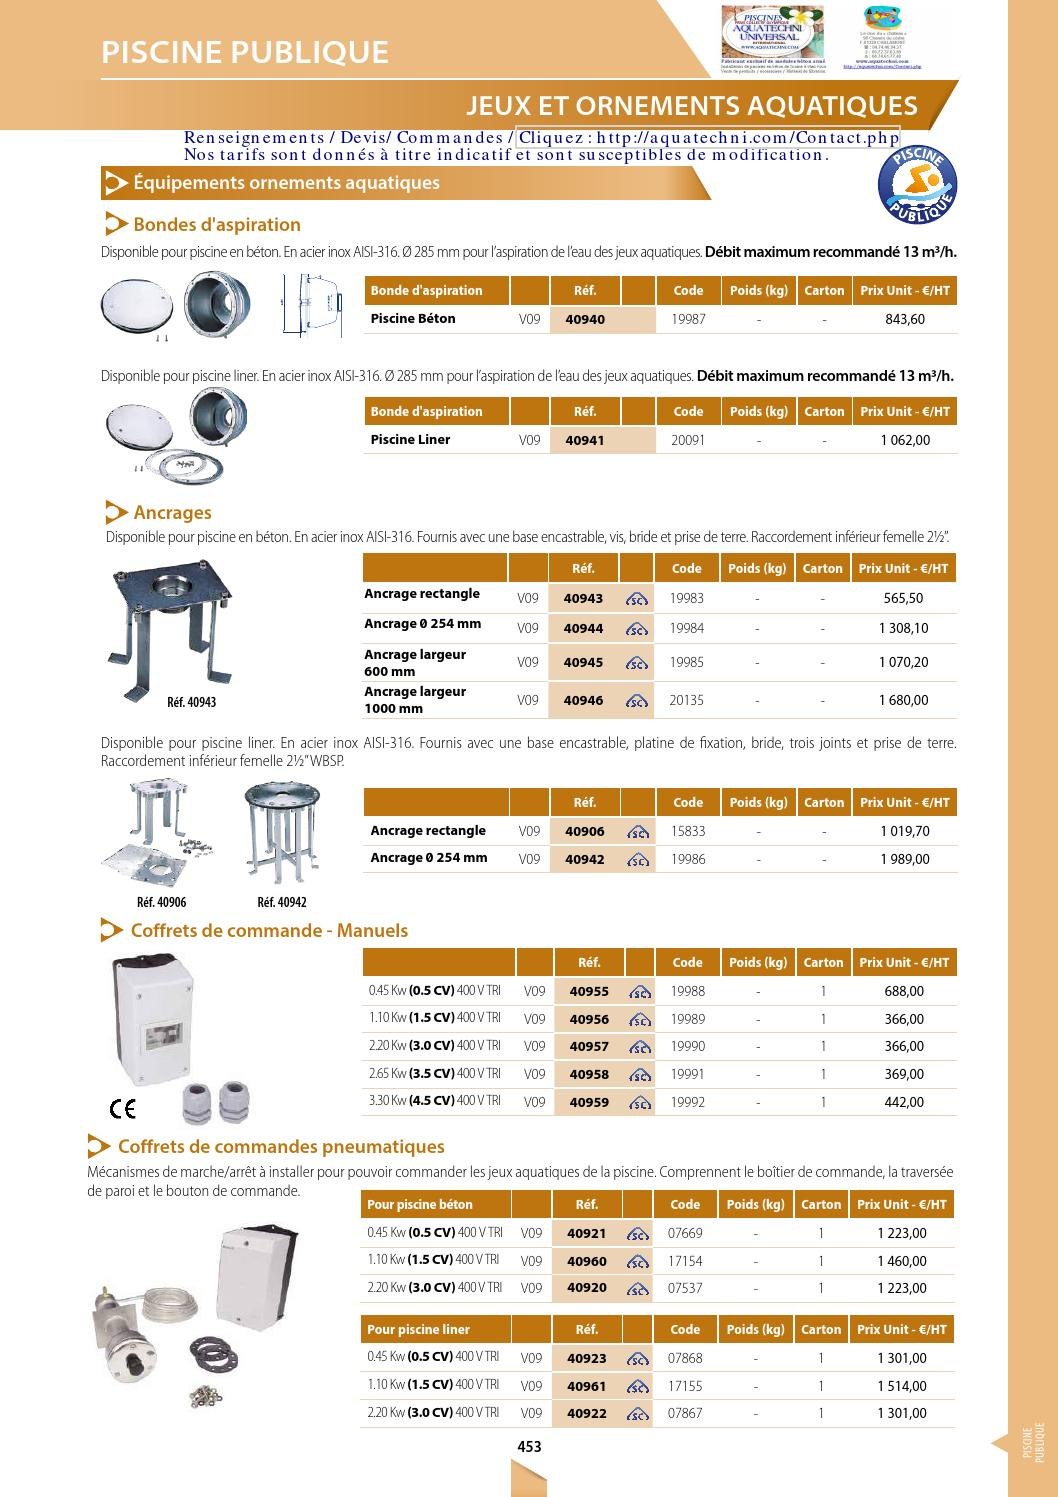 Cataloge General 2 2018 Aquatechni Universal By Sitti - Issuu concernant Piscine Encastrable